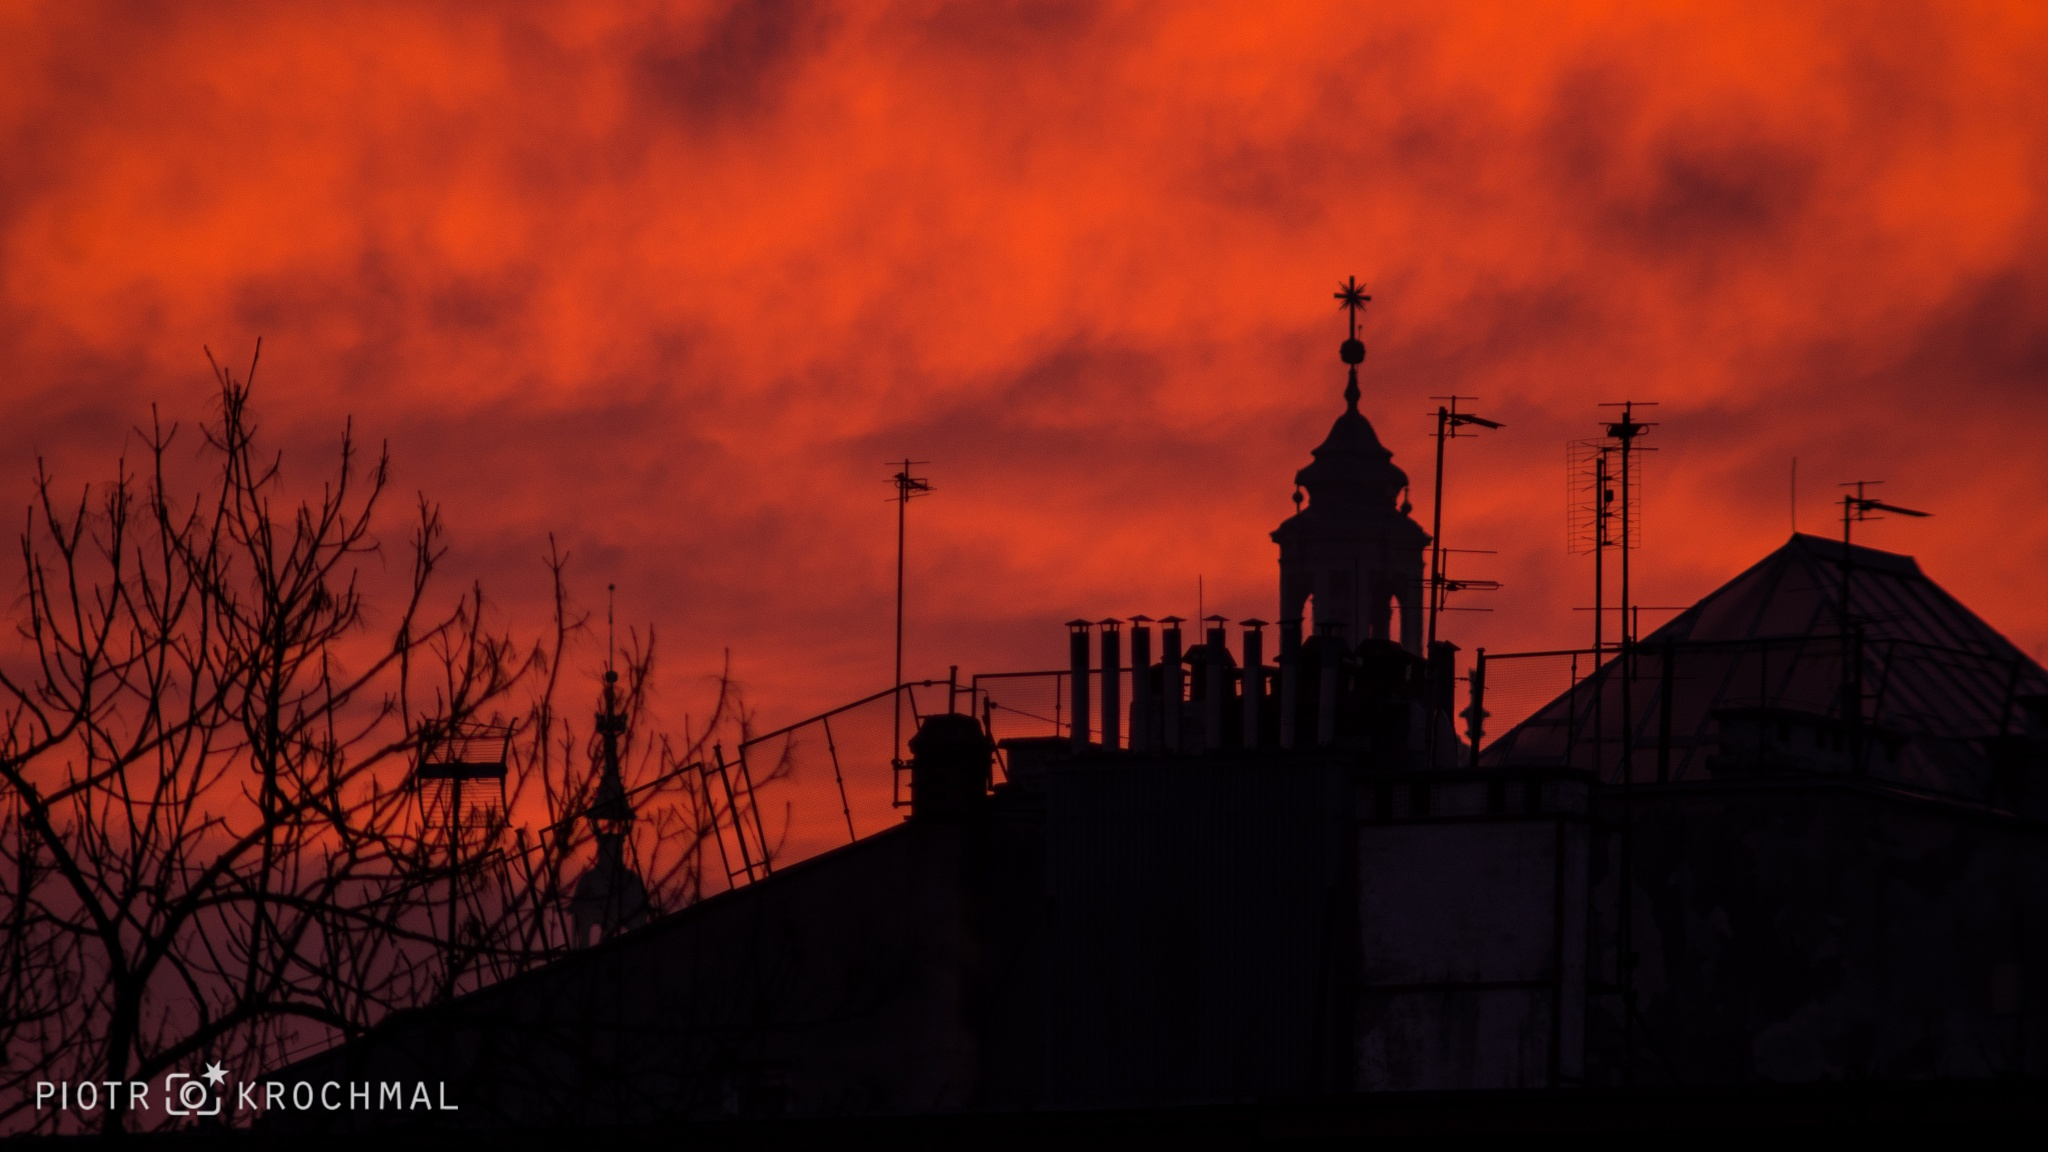 Morning Roofs by PiotrKrochmal